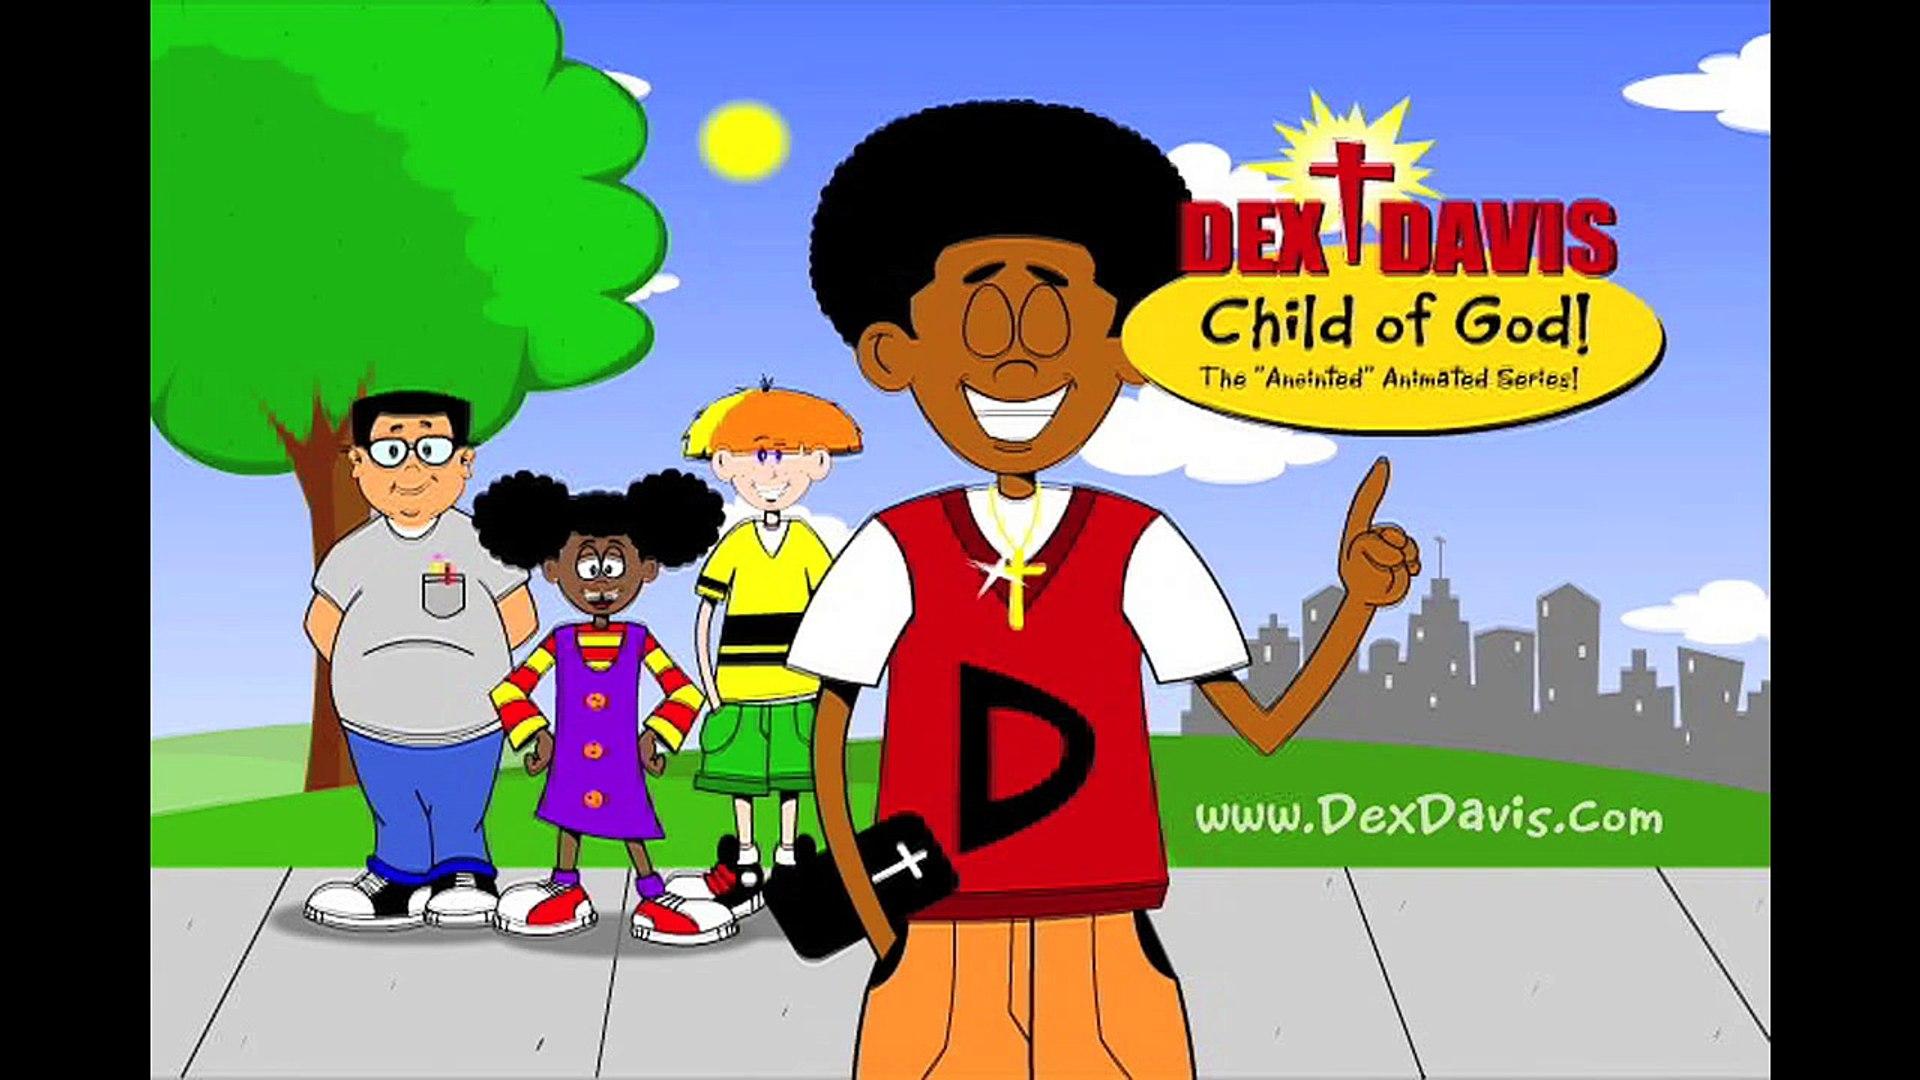 Dex Davis: Christian Cartoon Animated Web Series Video - Episode 3